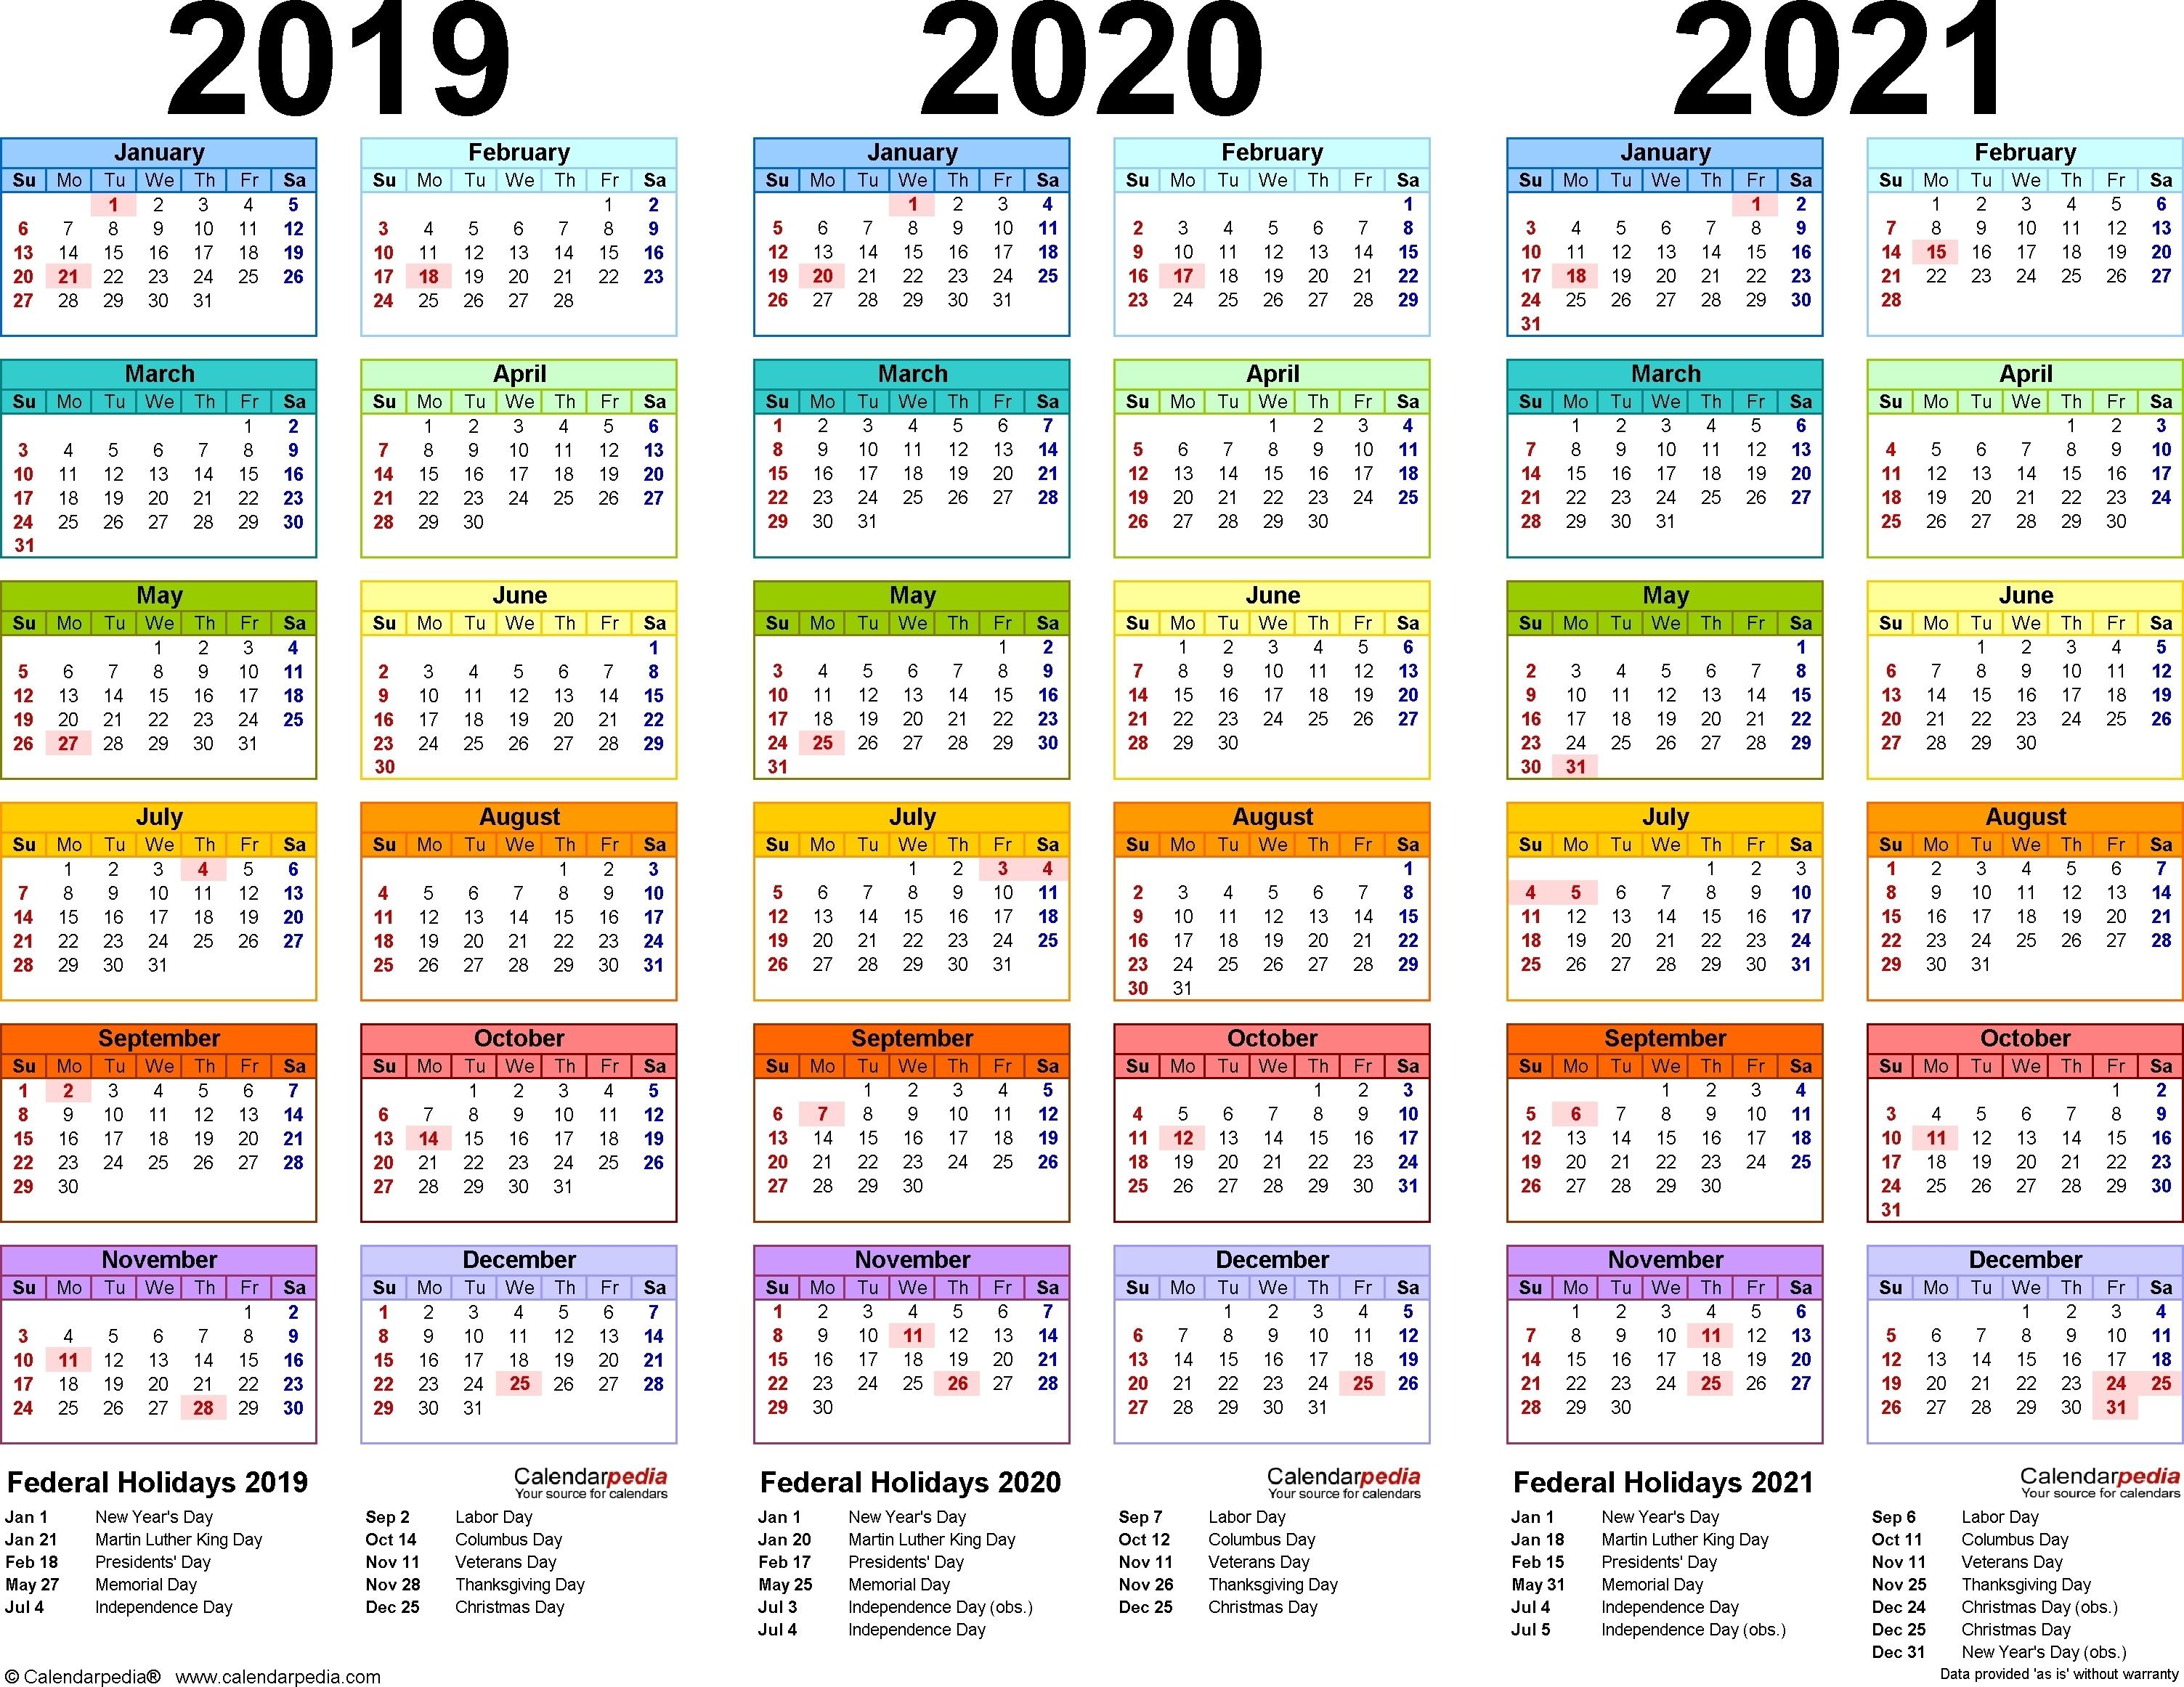 Calendar For School Holidays 2020 | Calendar Design Ideas-2020 Qld School Holidays Printable